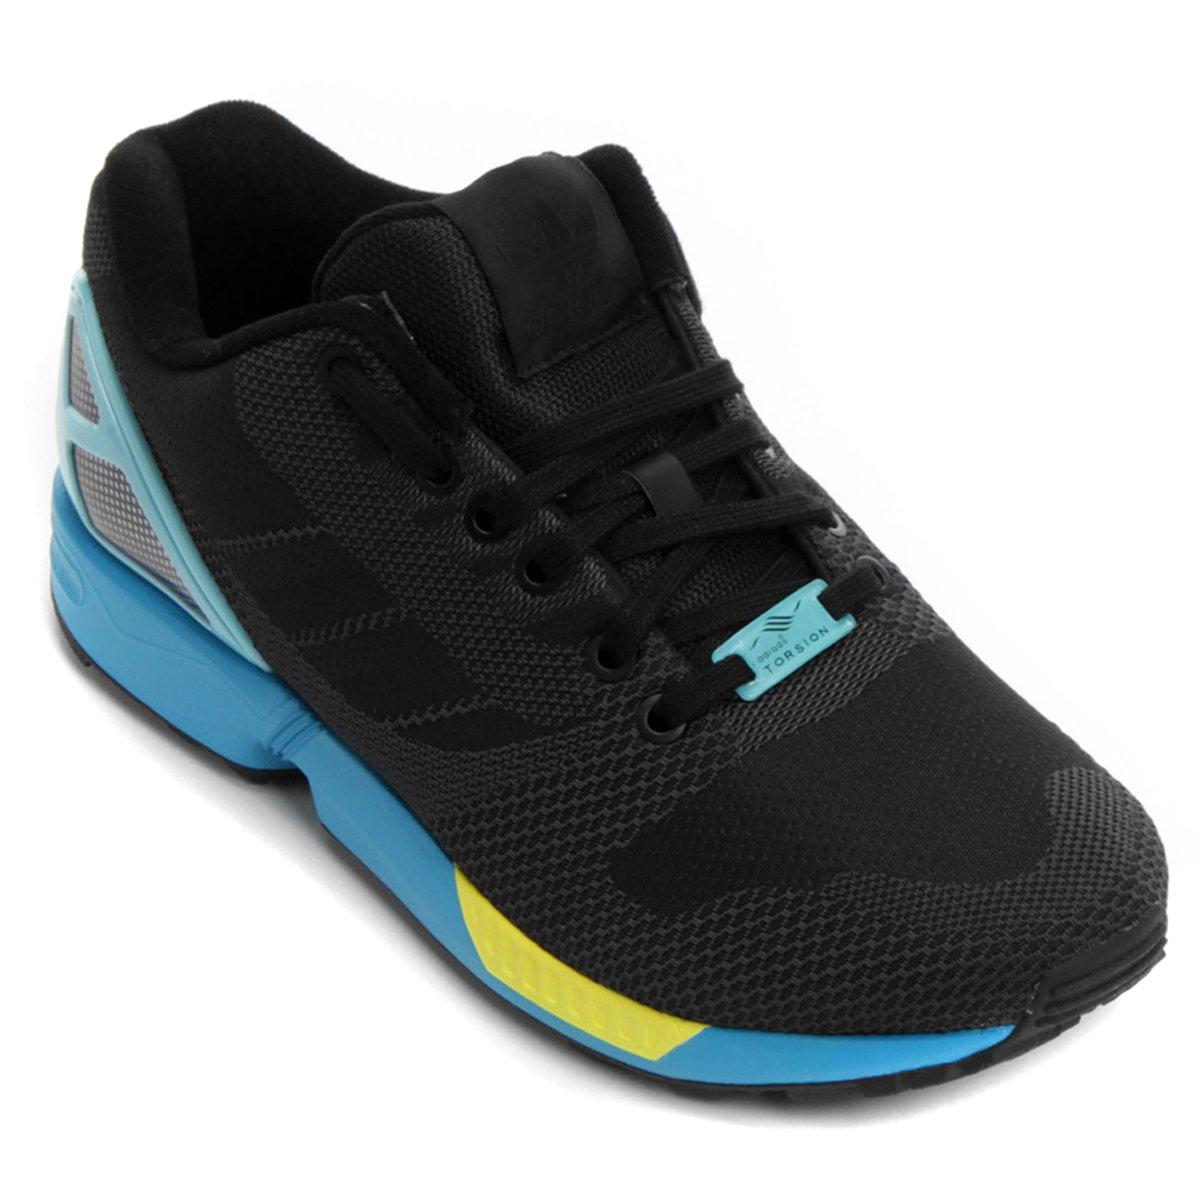 e84602a2173 Tênis Adidas ZX FLUX Weave - Compre Agora